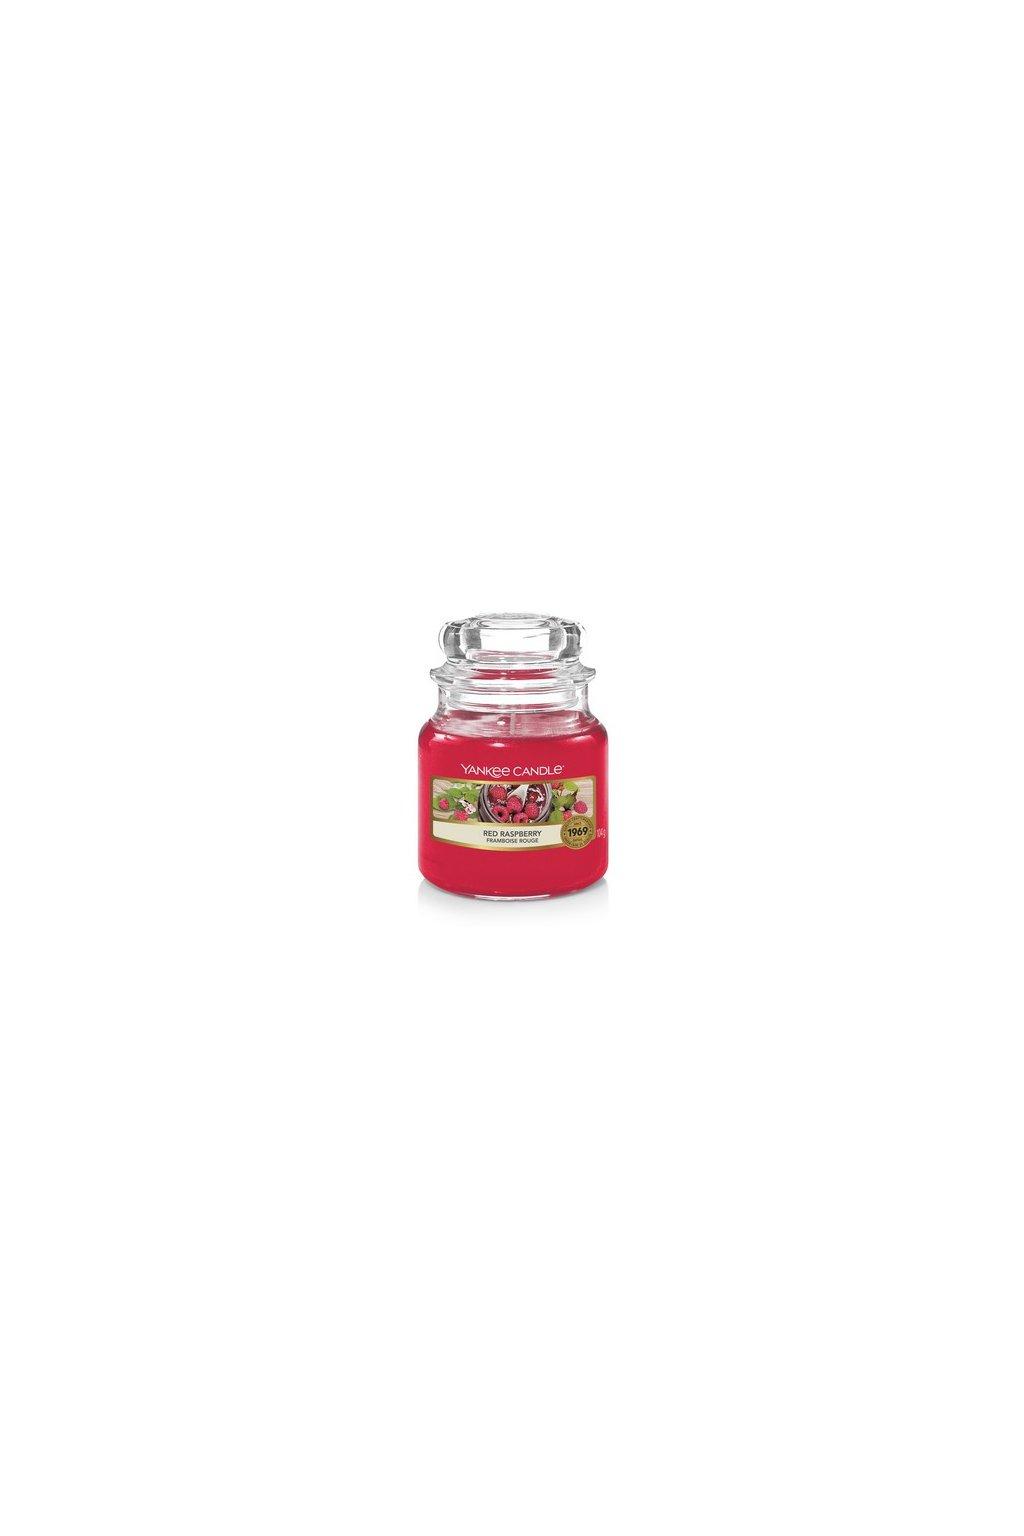 YANKEE CANDLE RED RASPBERRY 104g